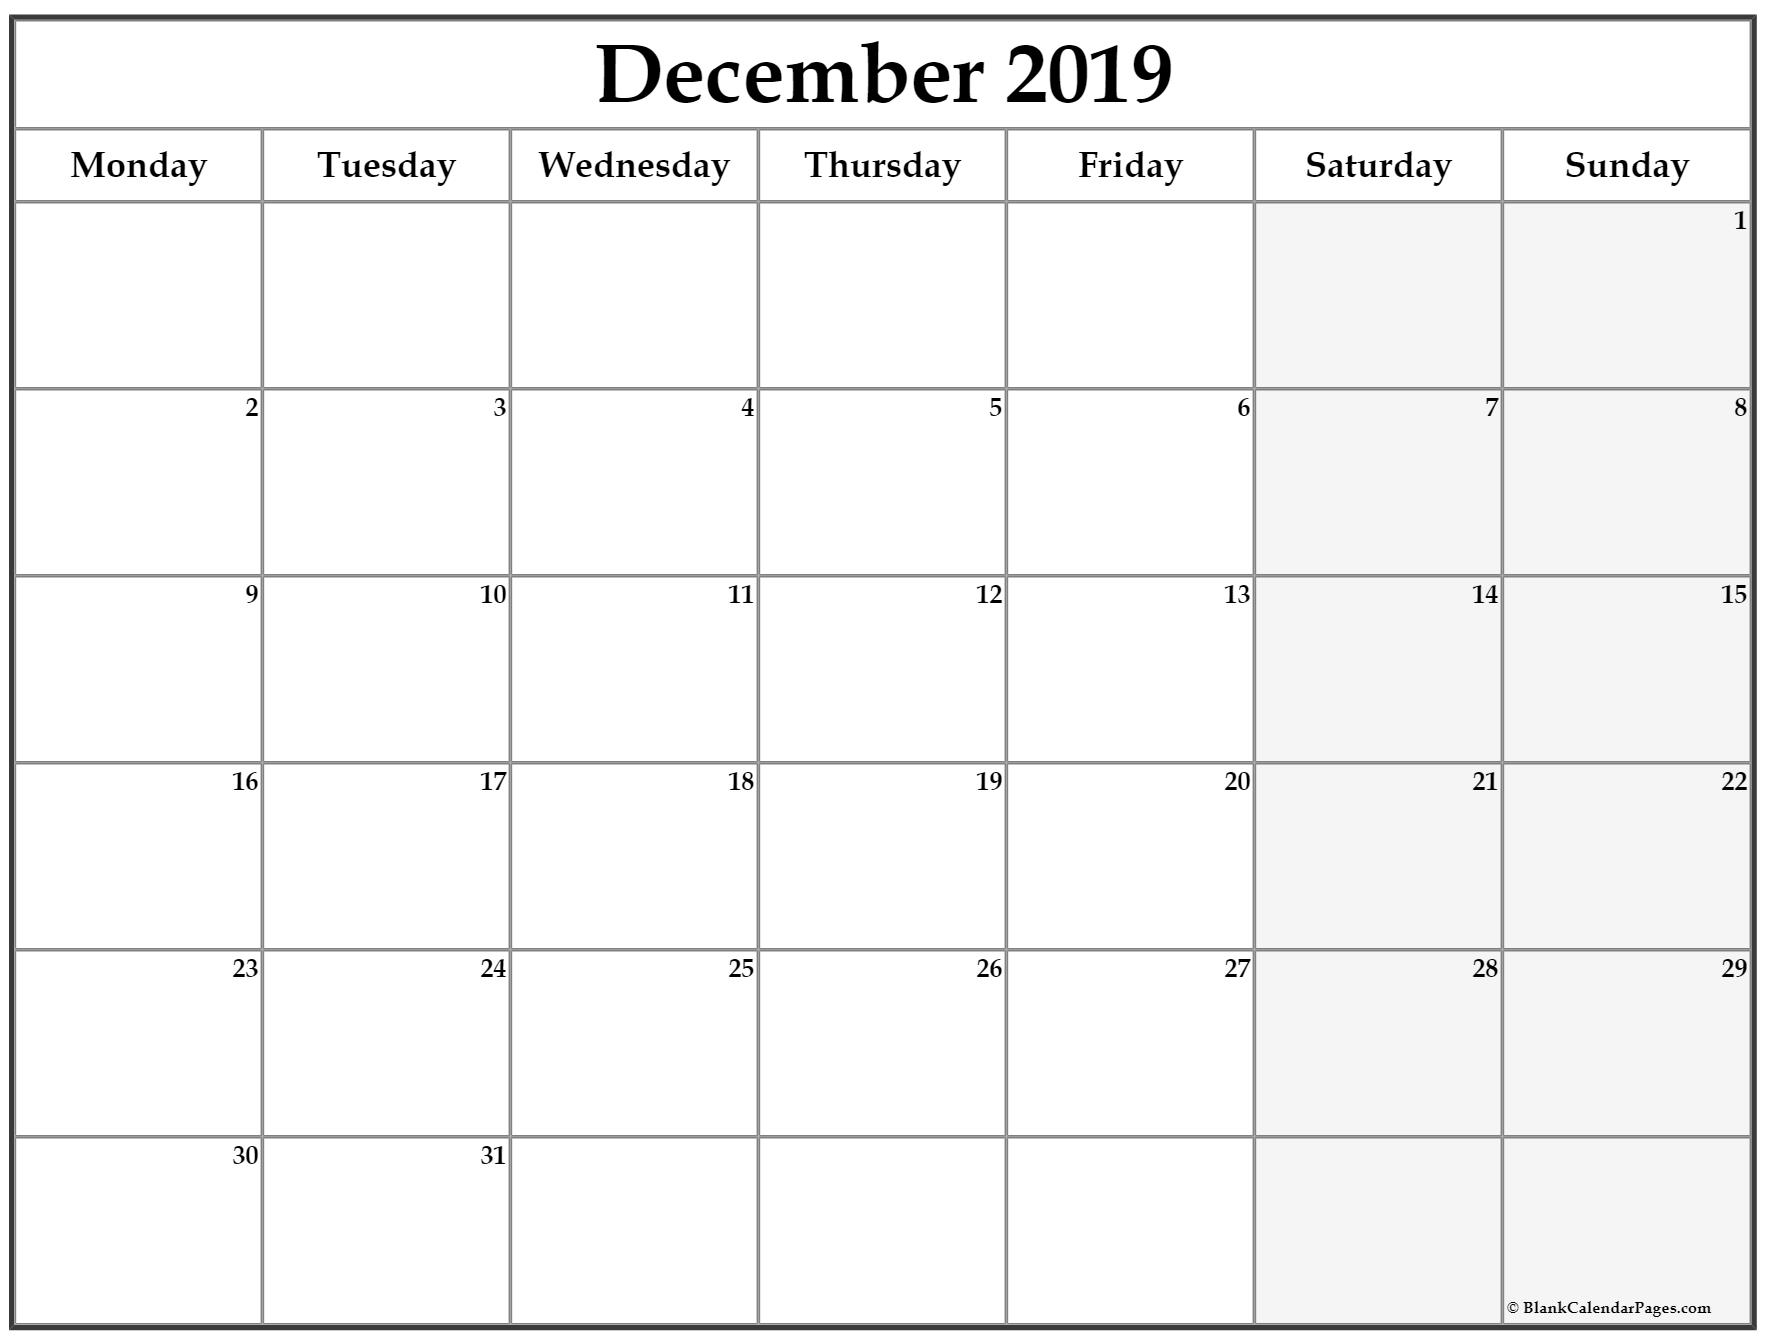 December 2019 Monday Calendar | Monday To Sunday